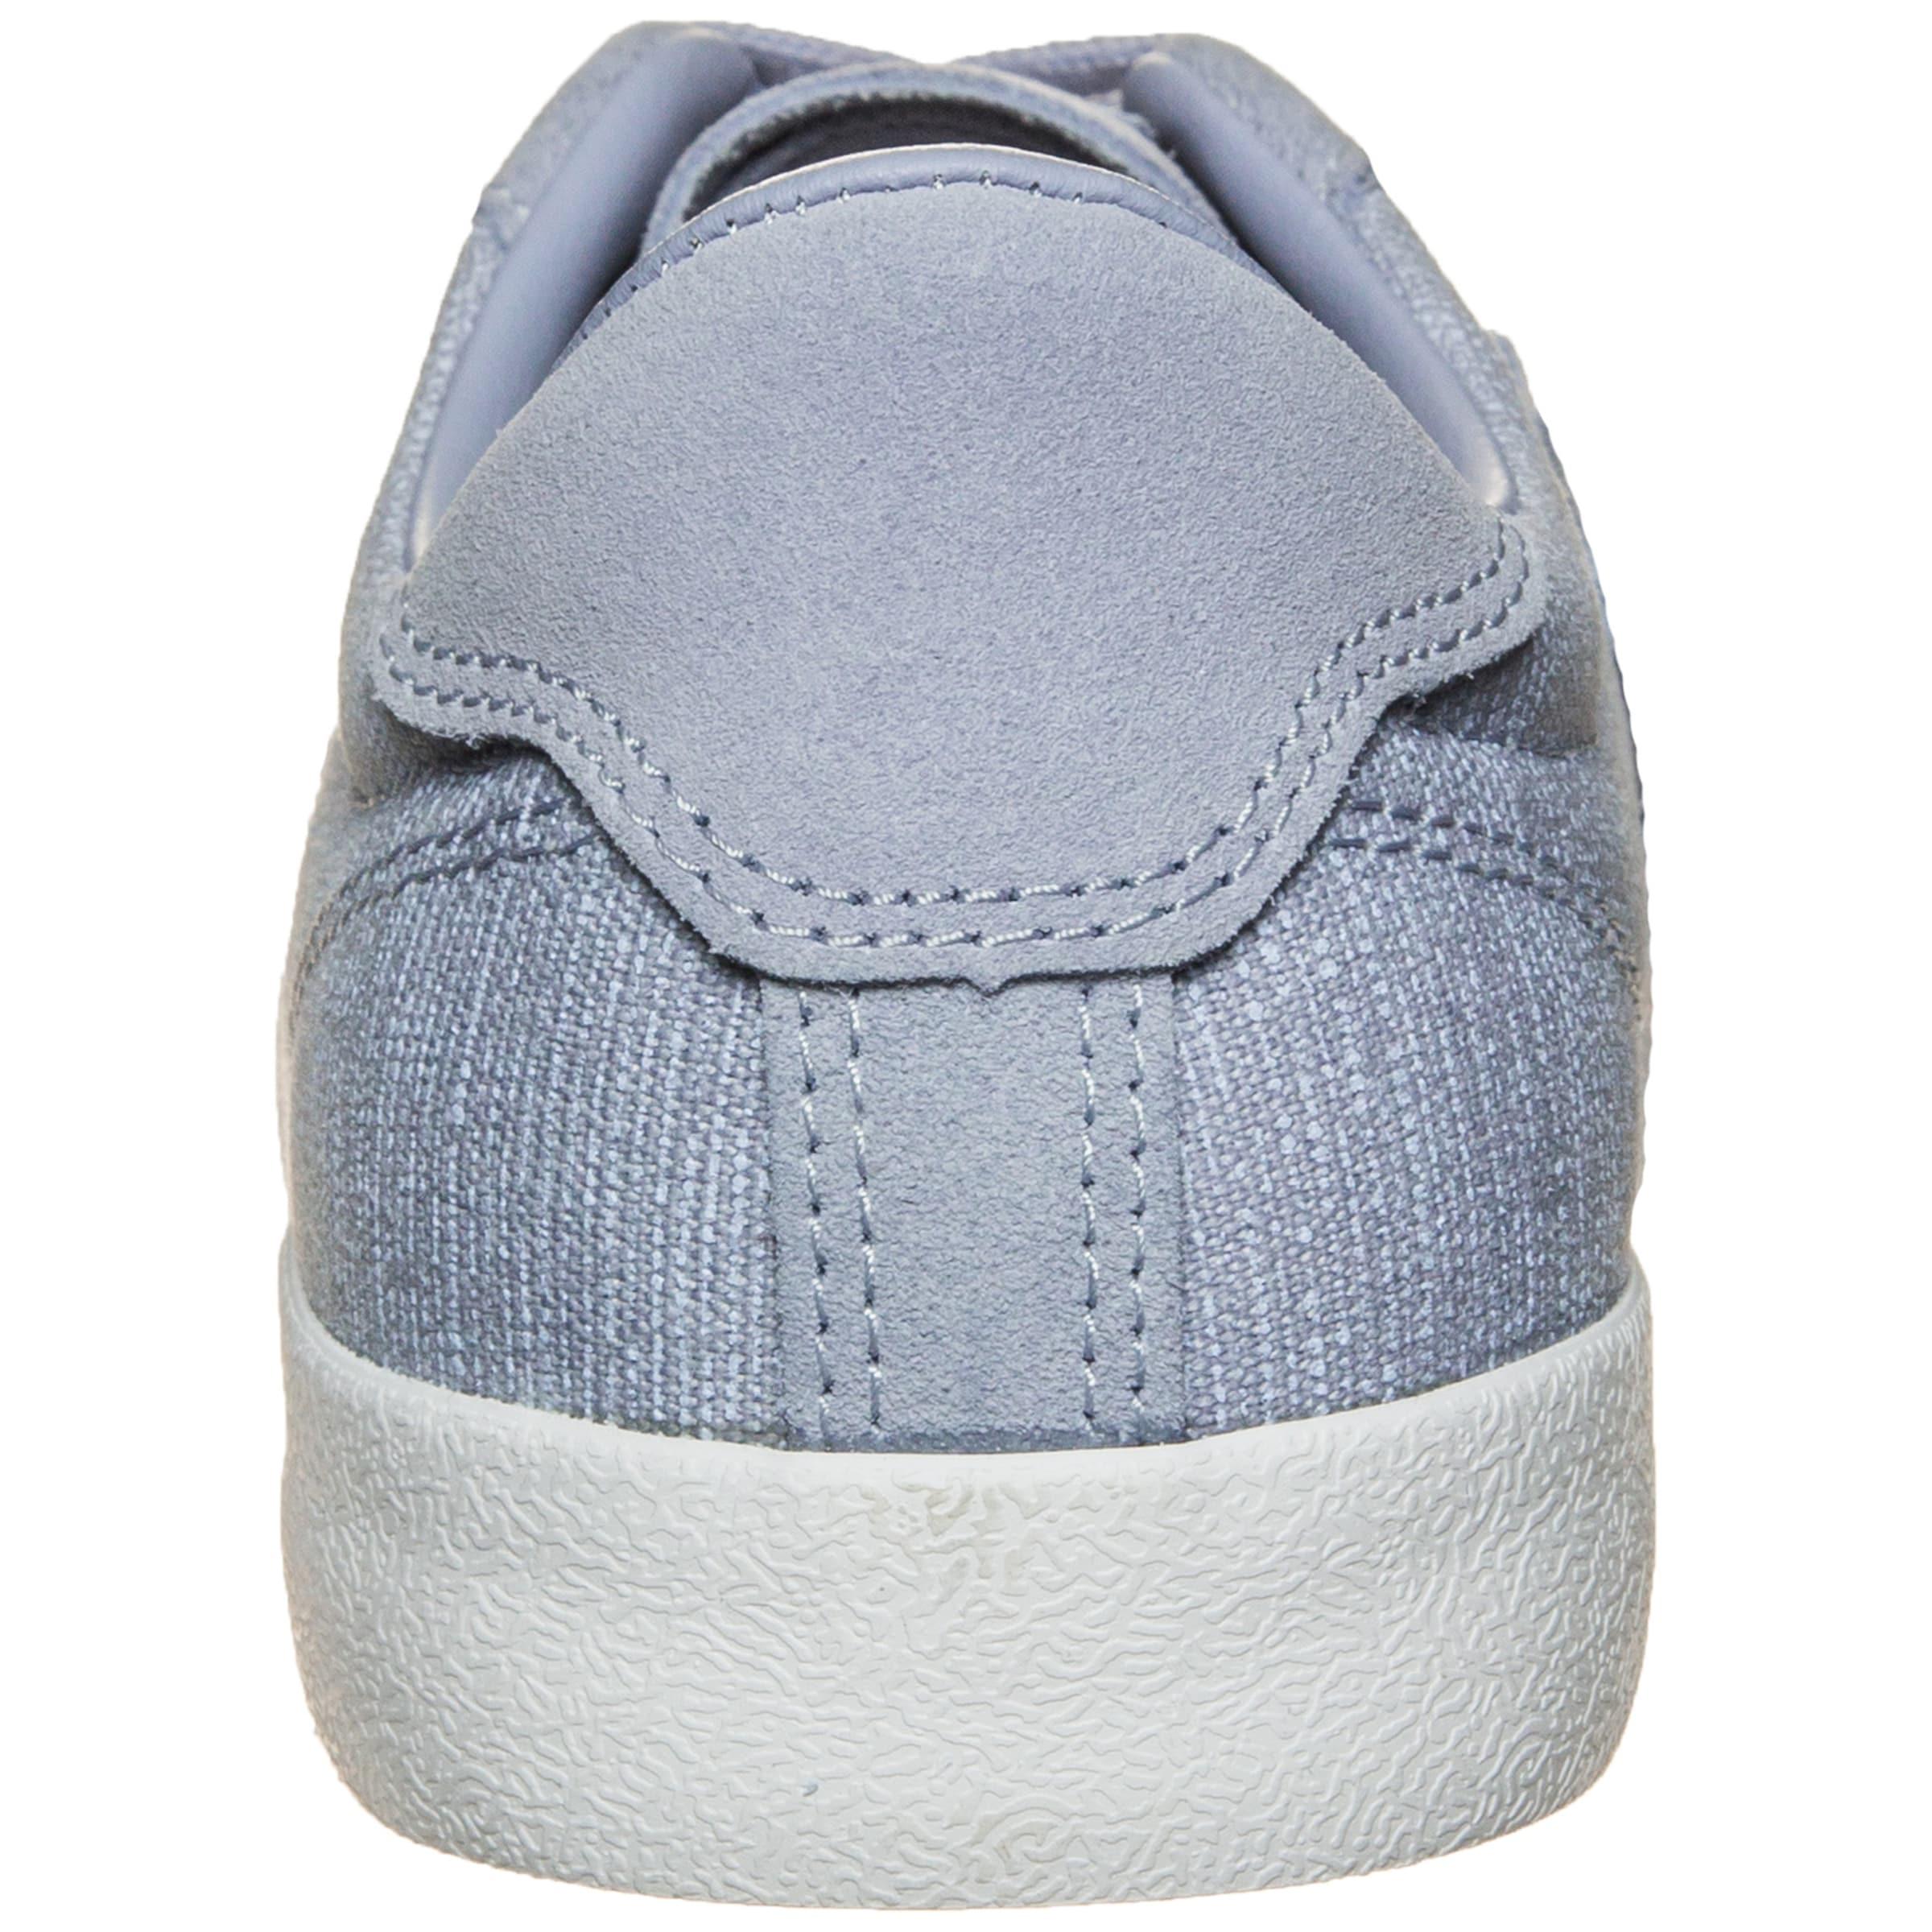 CONVERSE 'Cons Breakpoint OX' Sneaker Niedriger Versand Günstiger Preis 6AFB94r2G